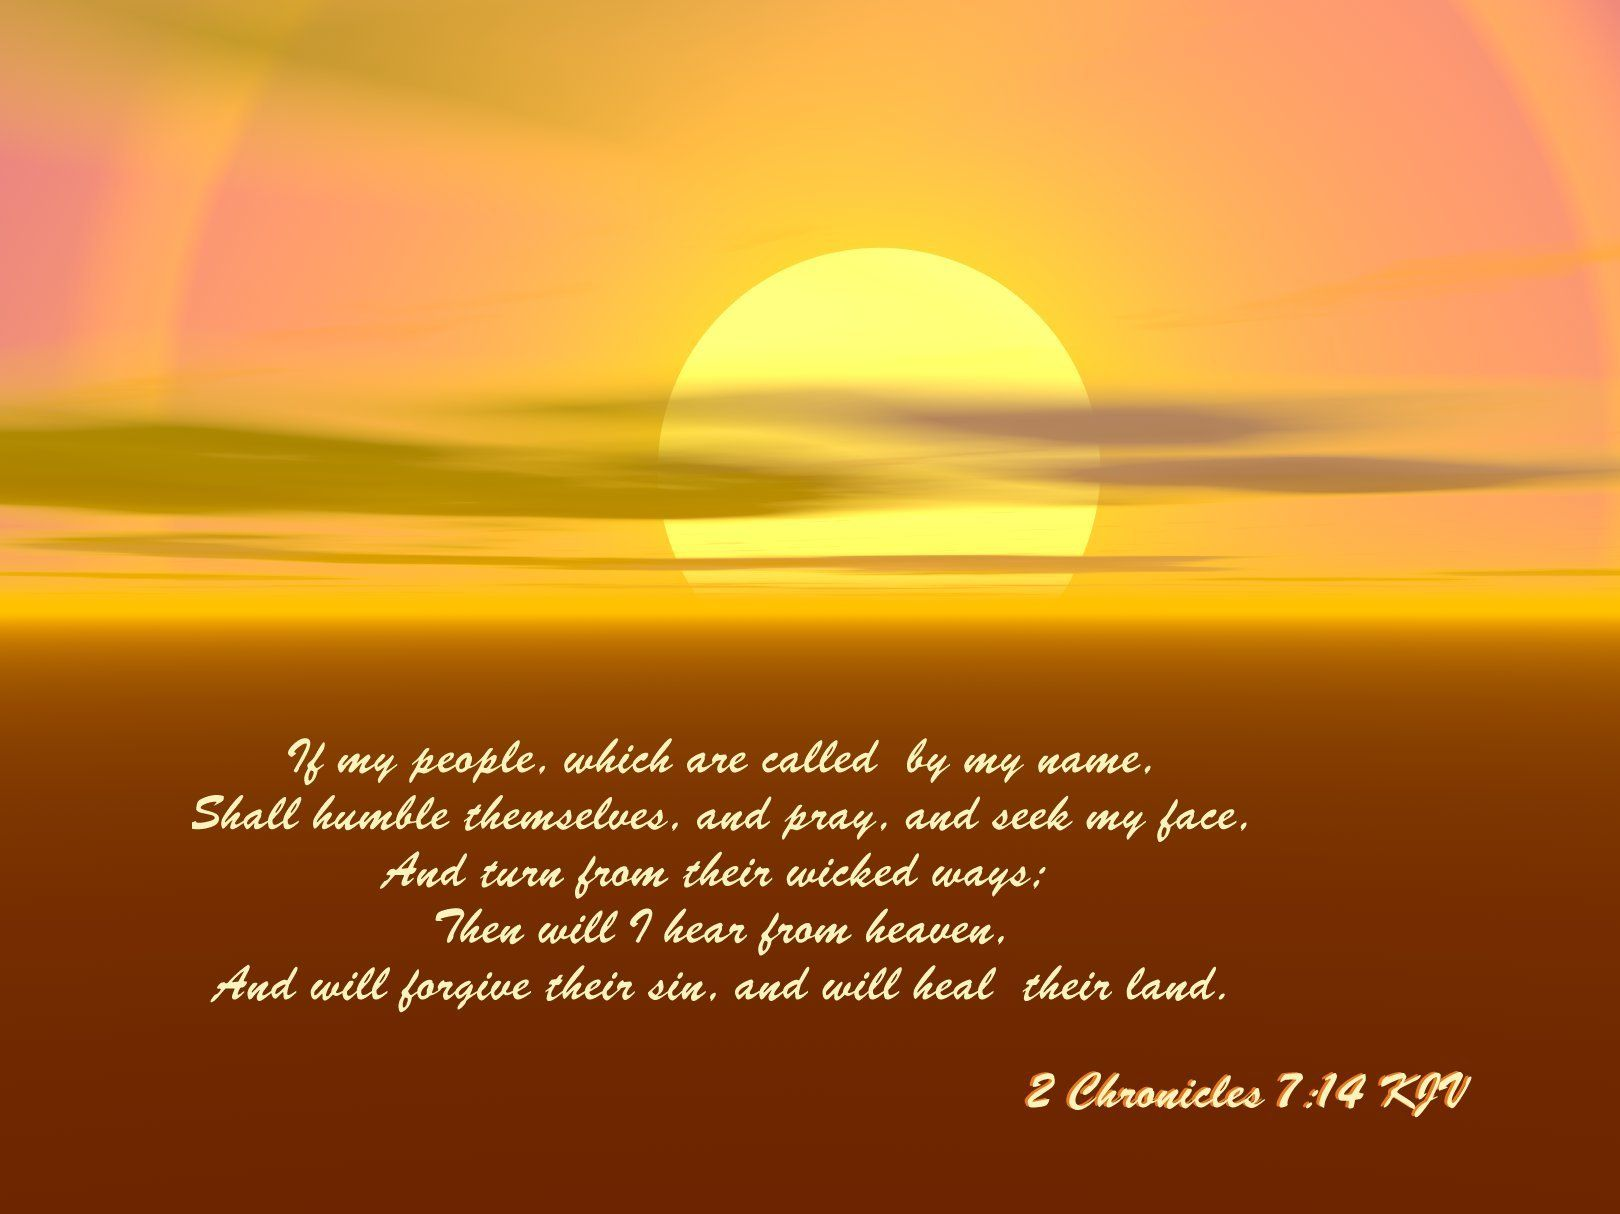 Christian Desktop Background Downloads Chronicles 714 1620x1214